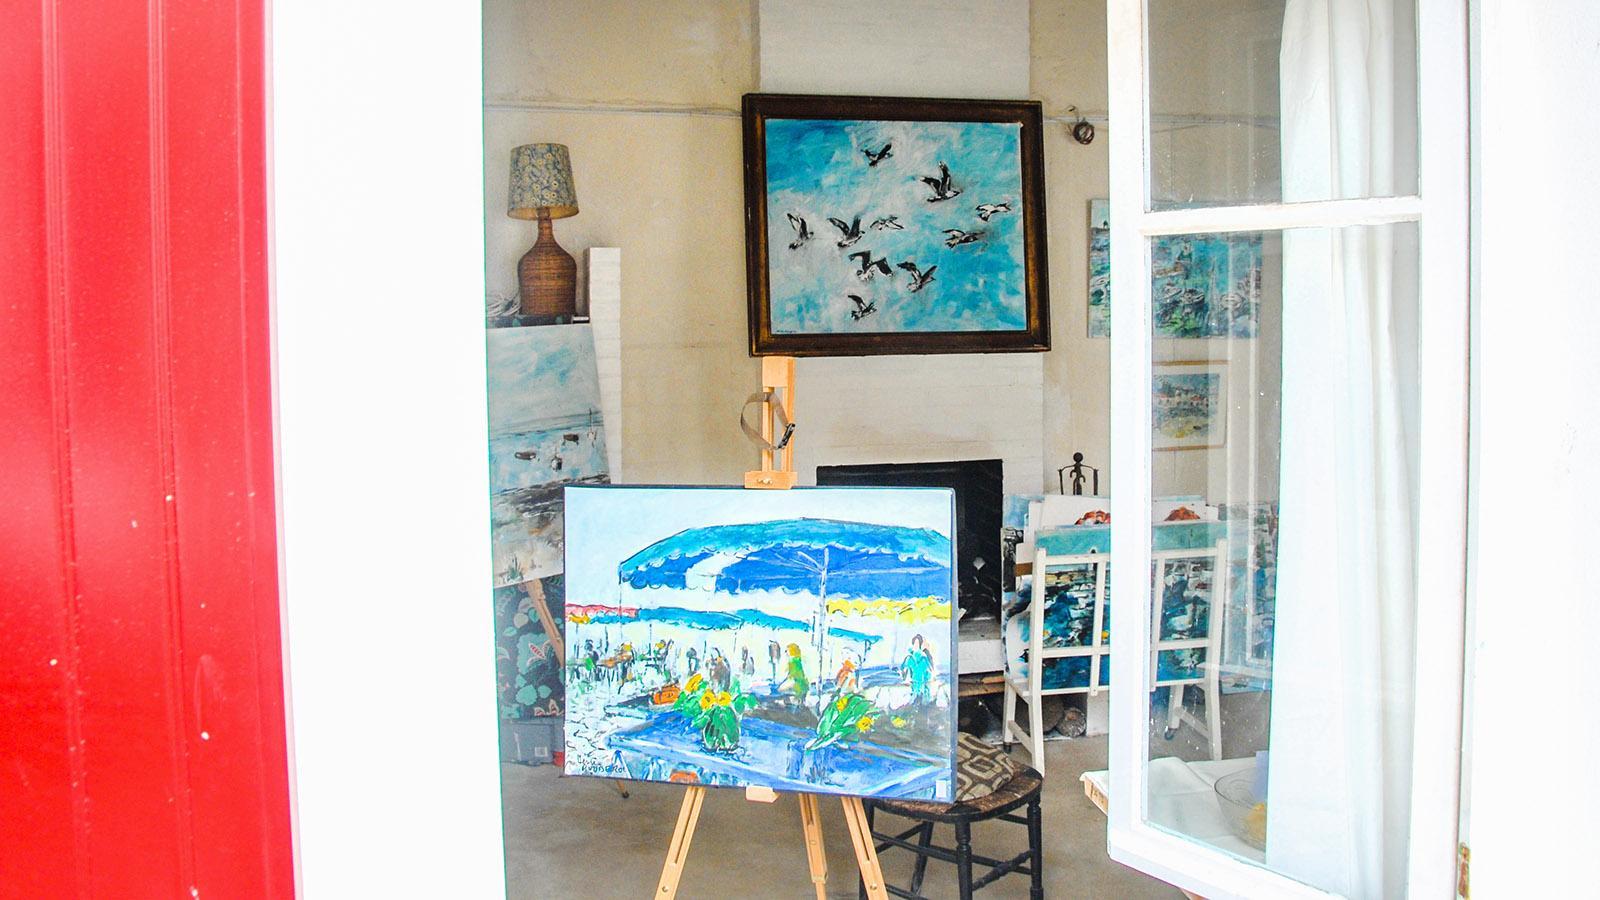 Île d'Yeu: Das Atelier von Henri Rouberol in Port-Joinville. Foto: Hilke Maunder